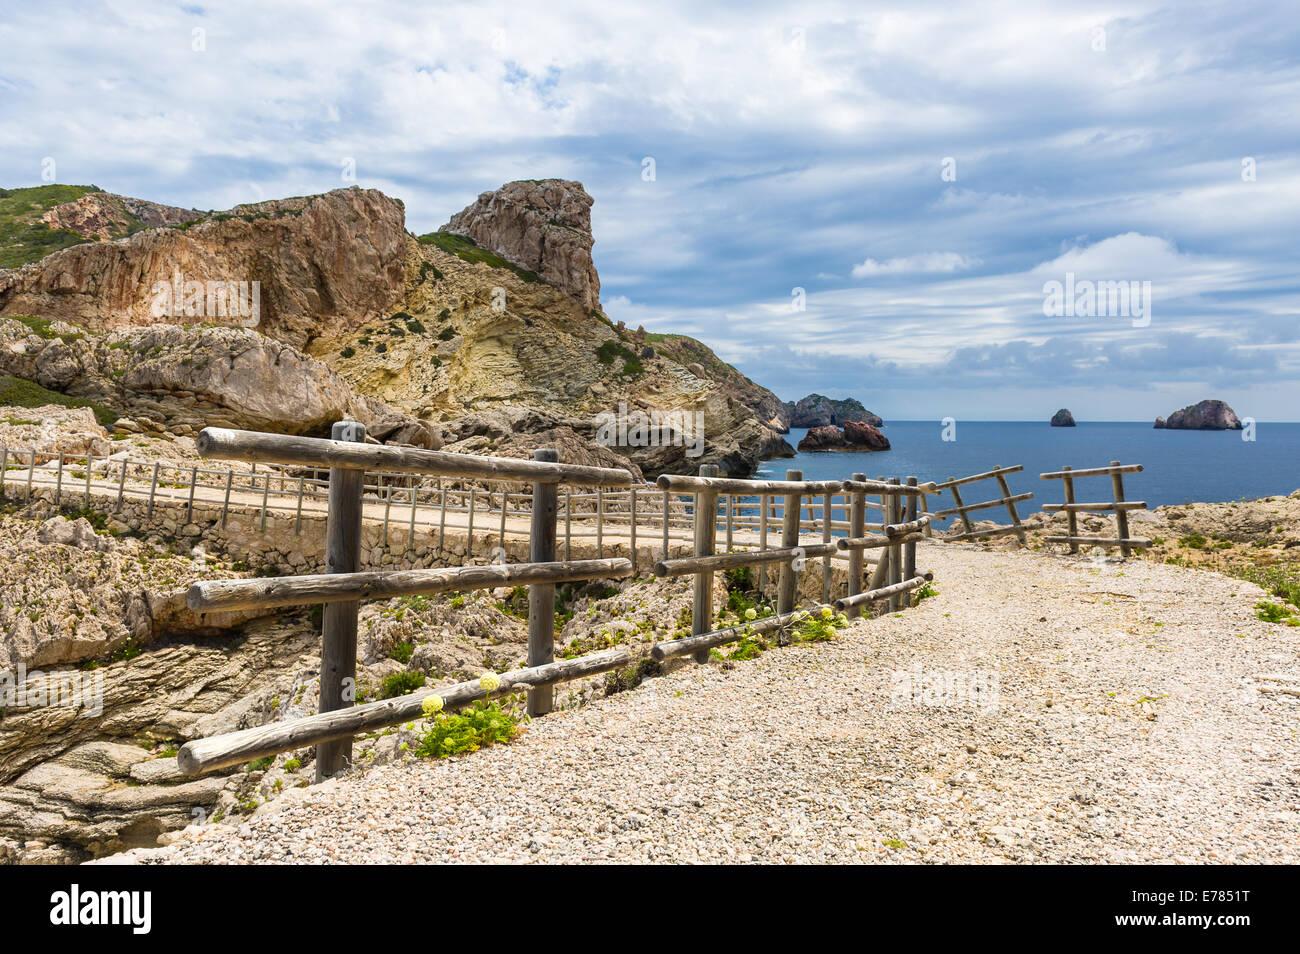 Balearic island pedestrian way - Stock Image